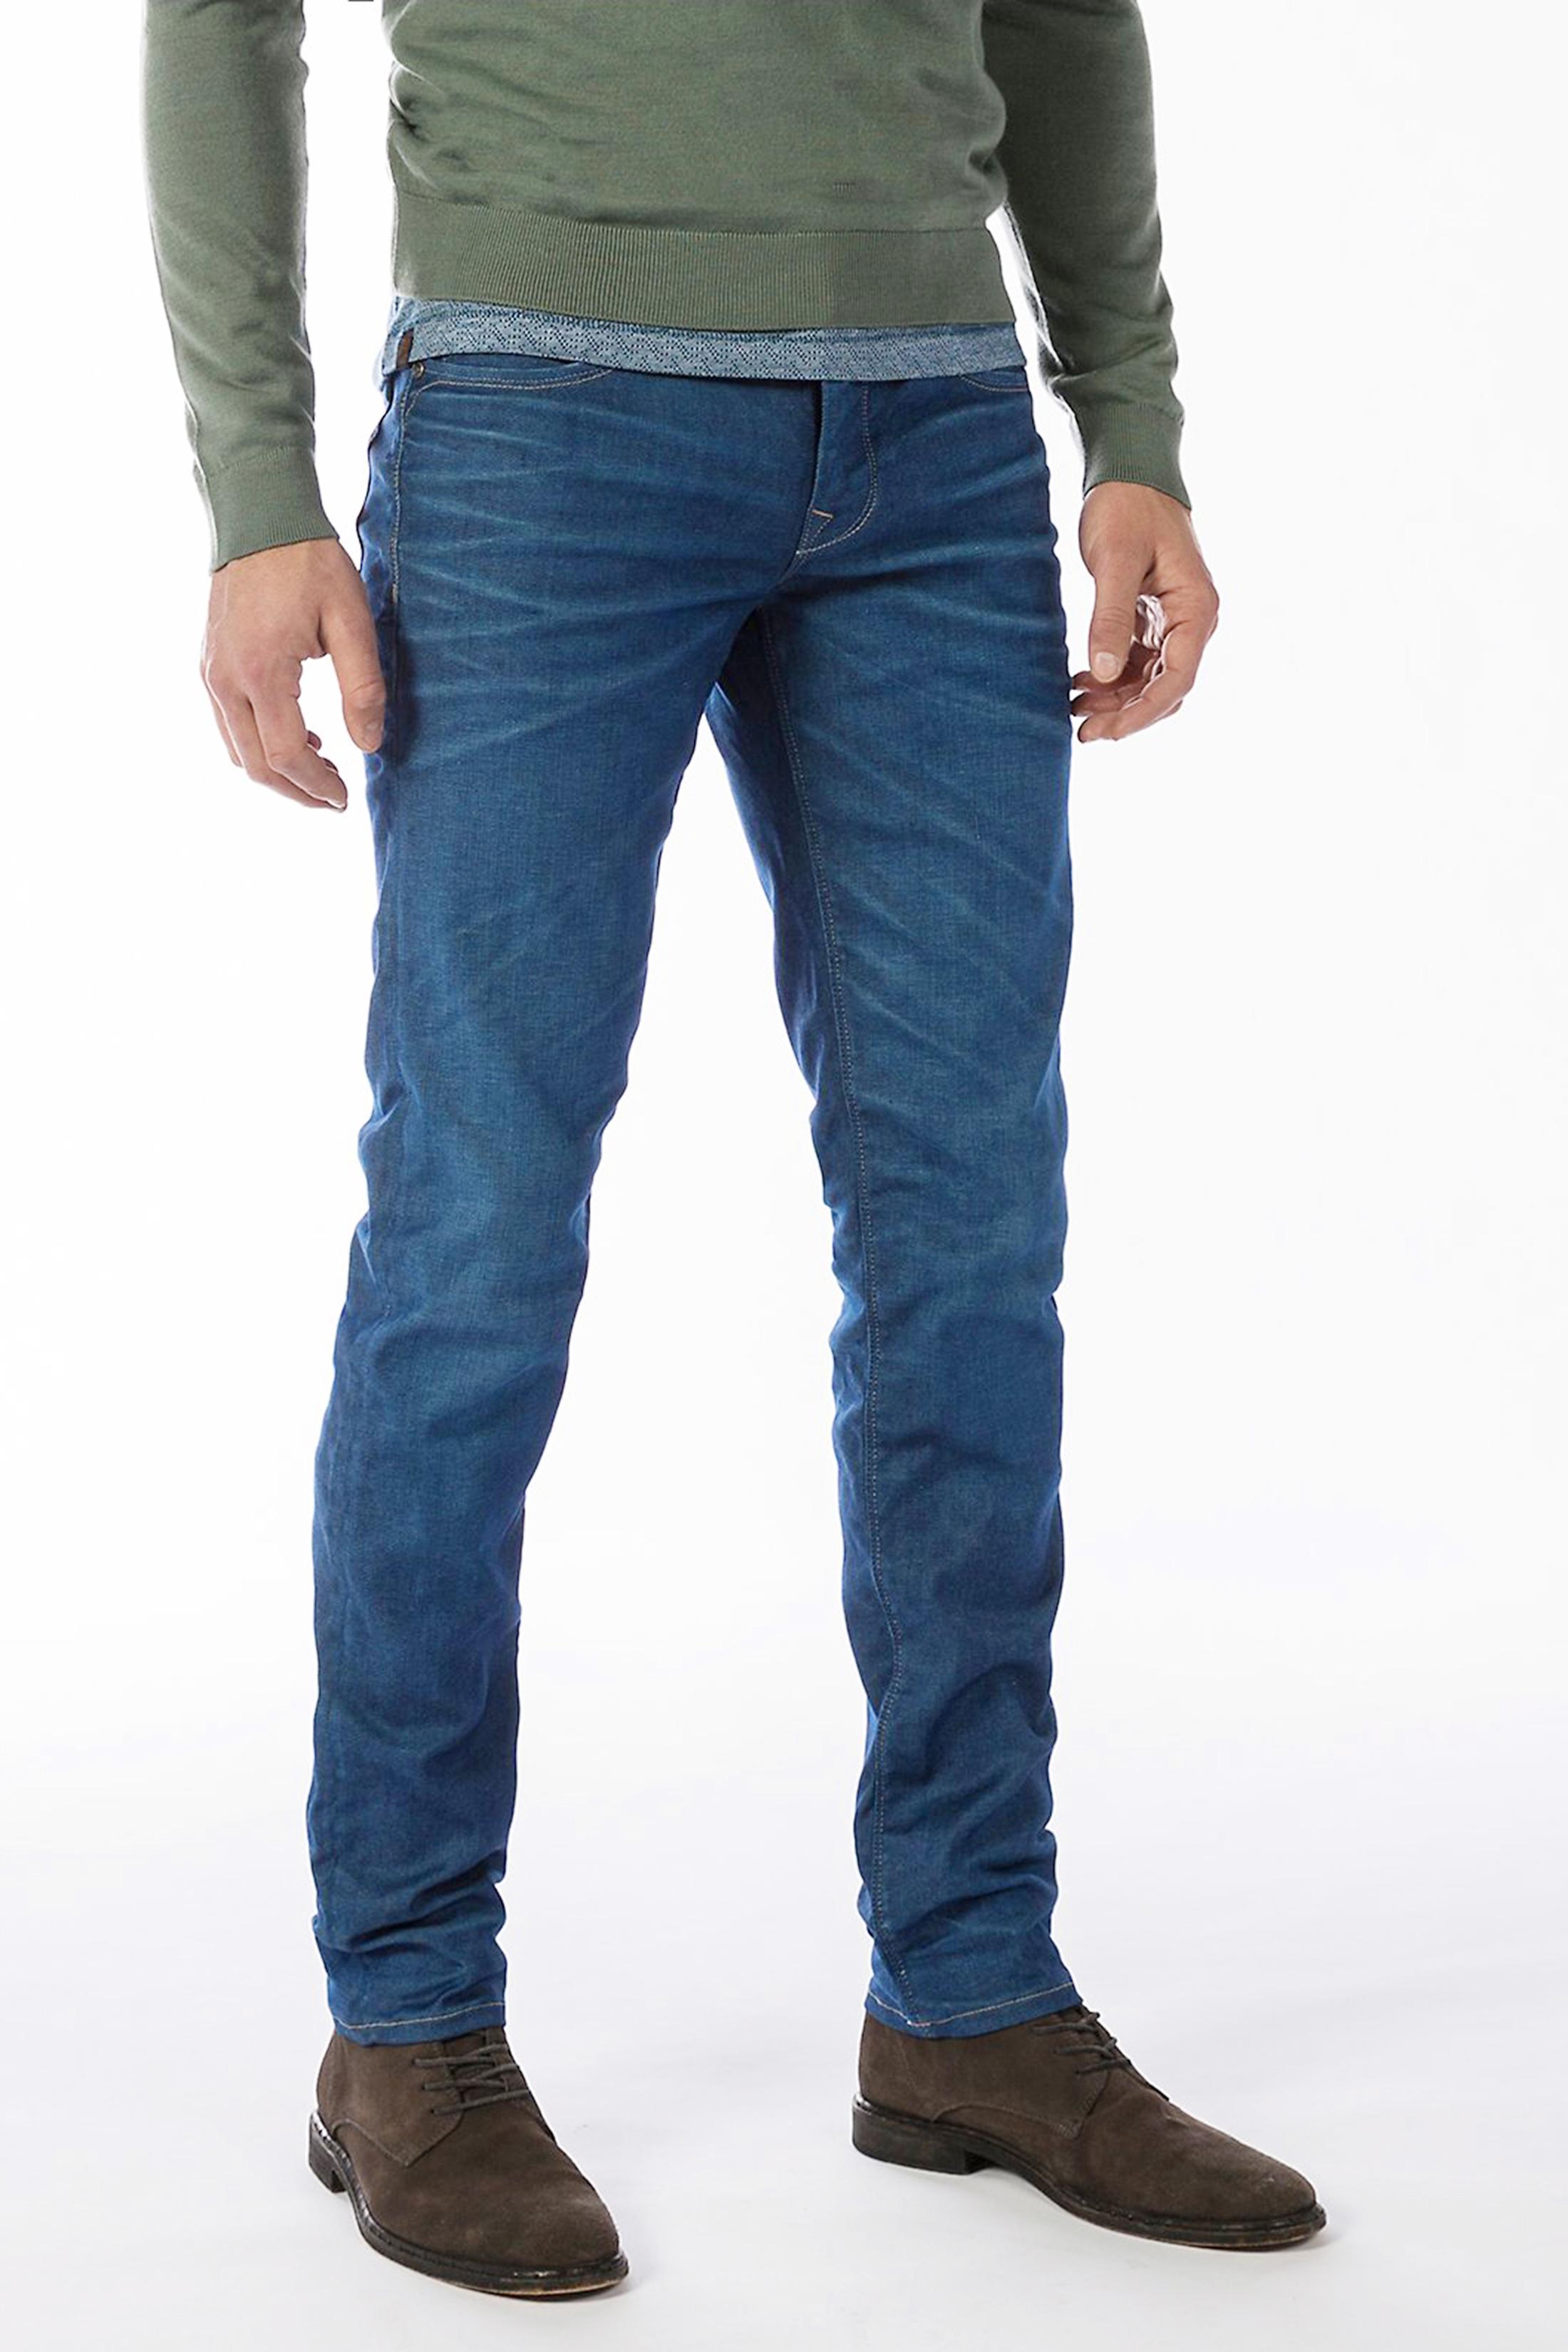 Vanguard V7 Rider Jeans